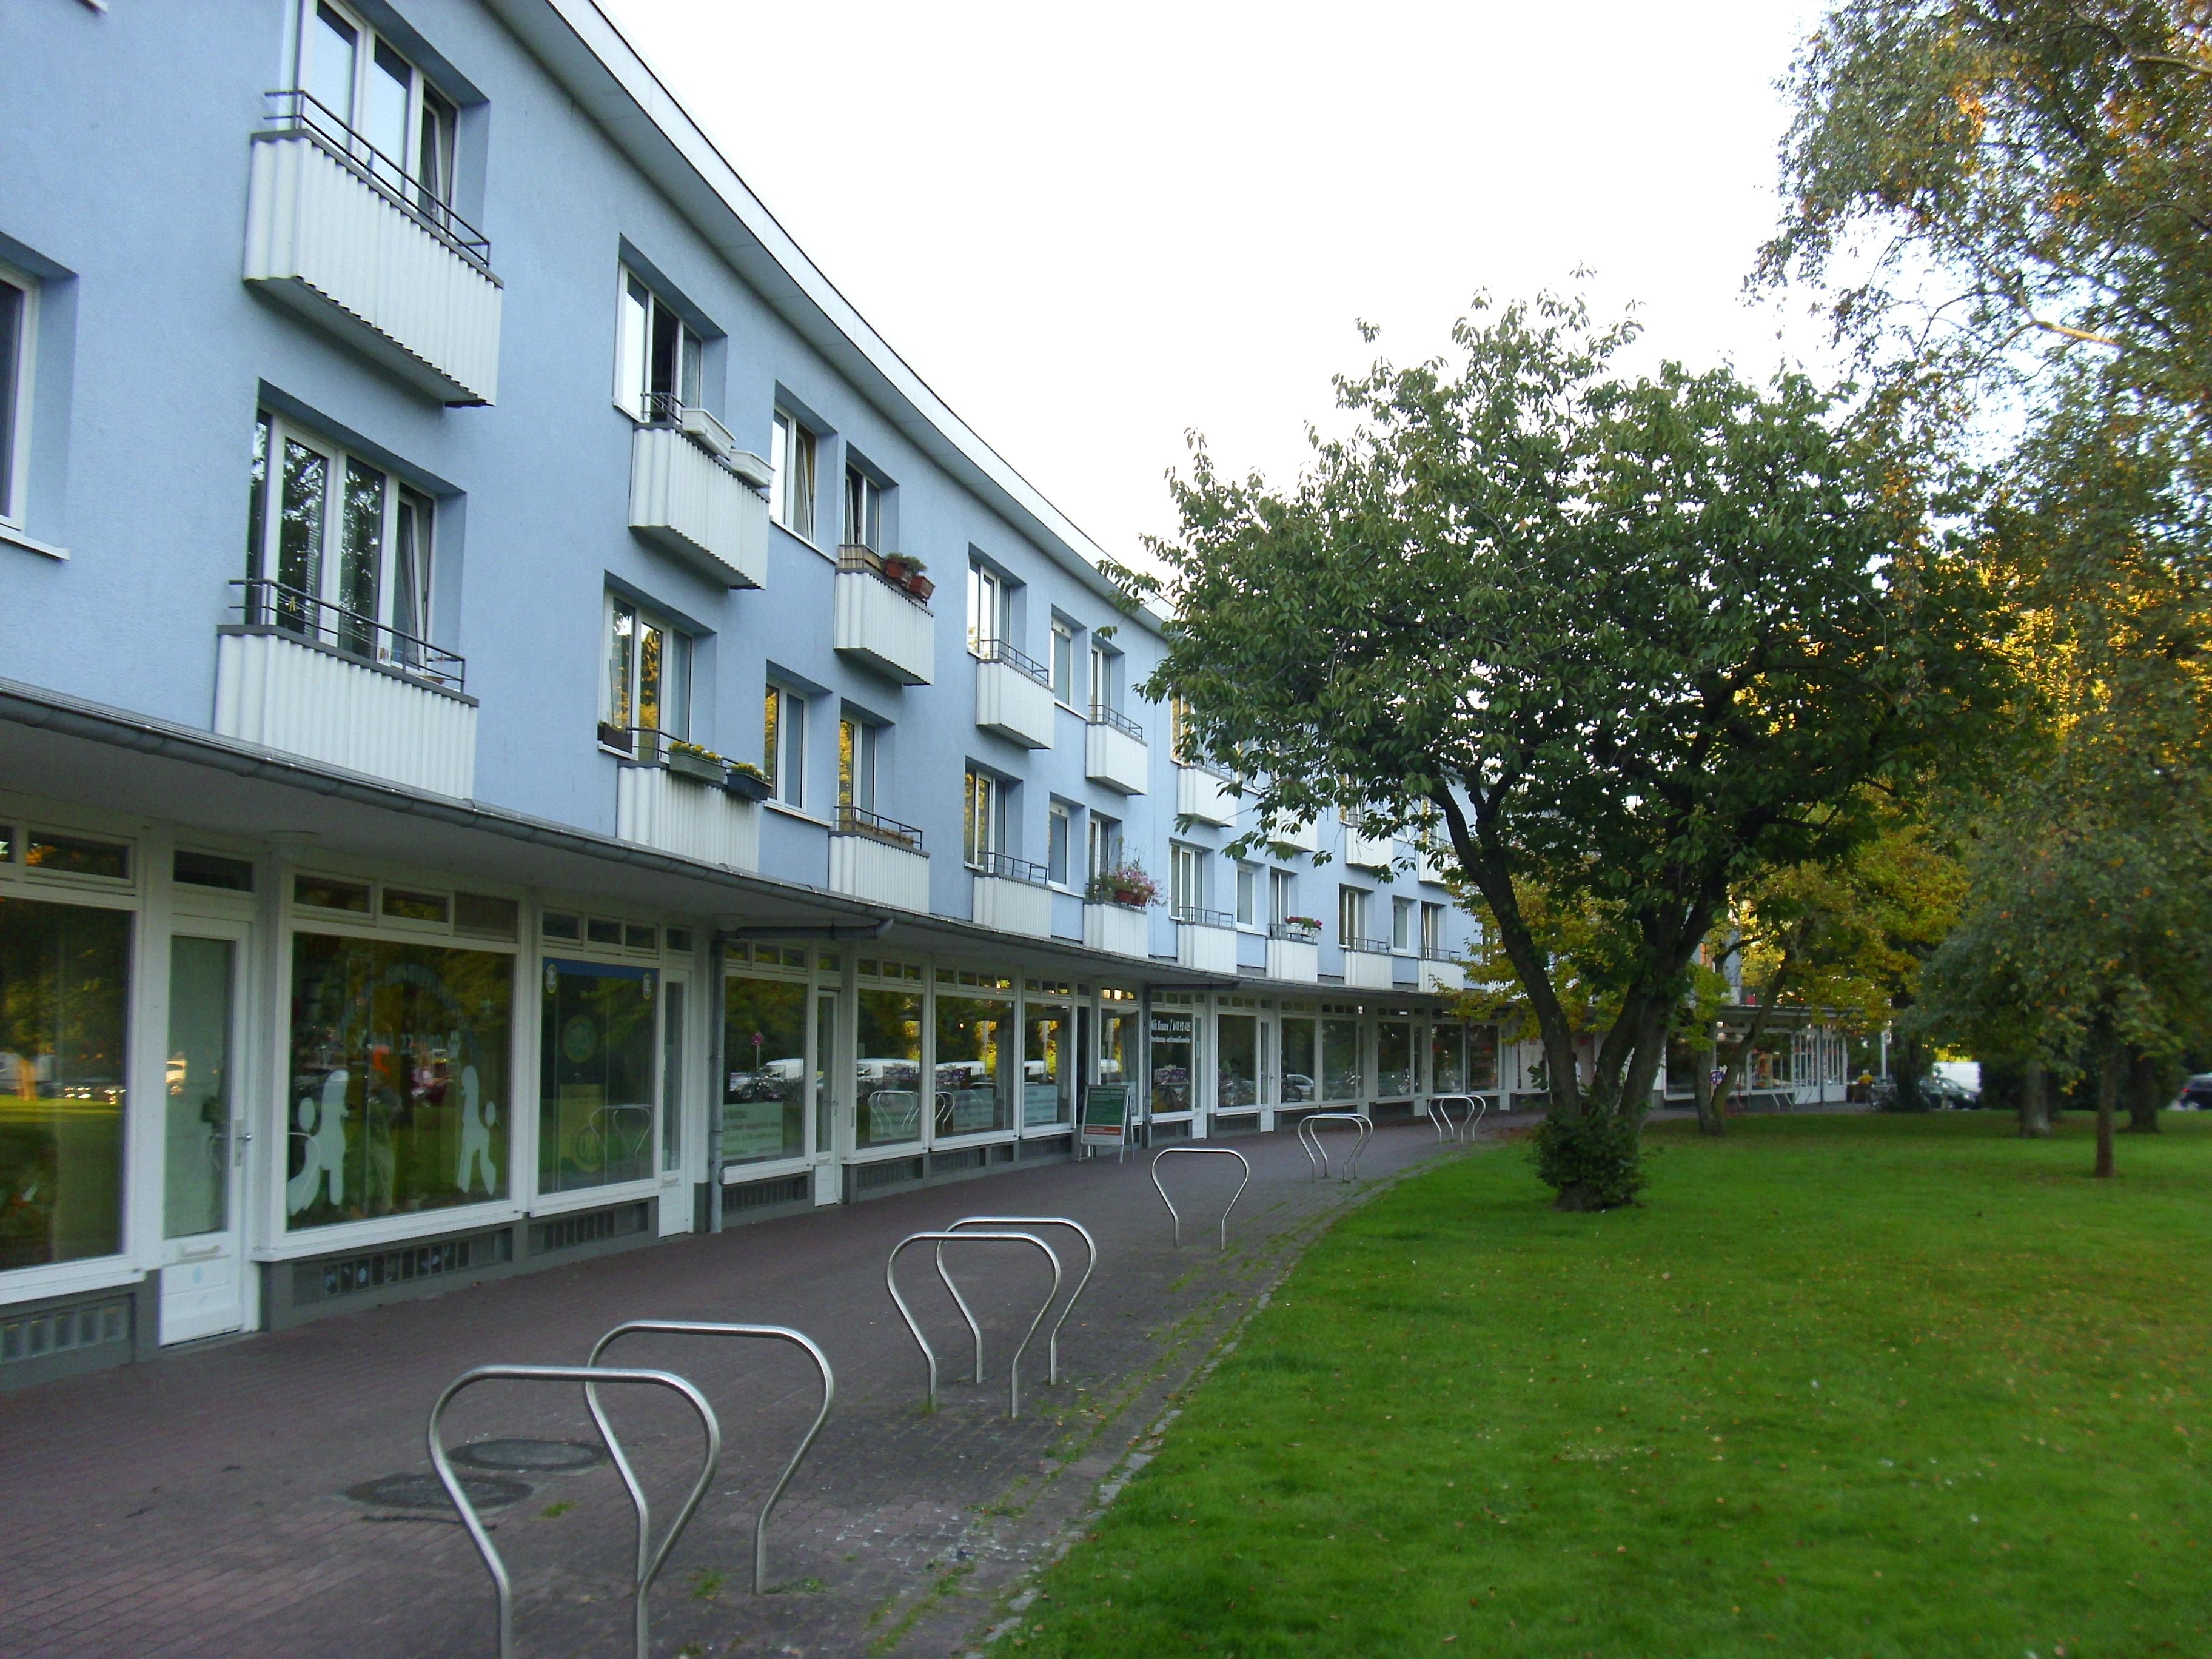 Datei Gartenstadt Farmsen Hamburg Farmsen Berne Jpg